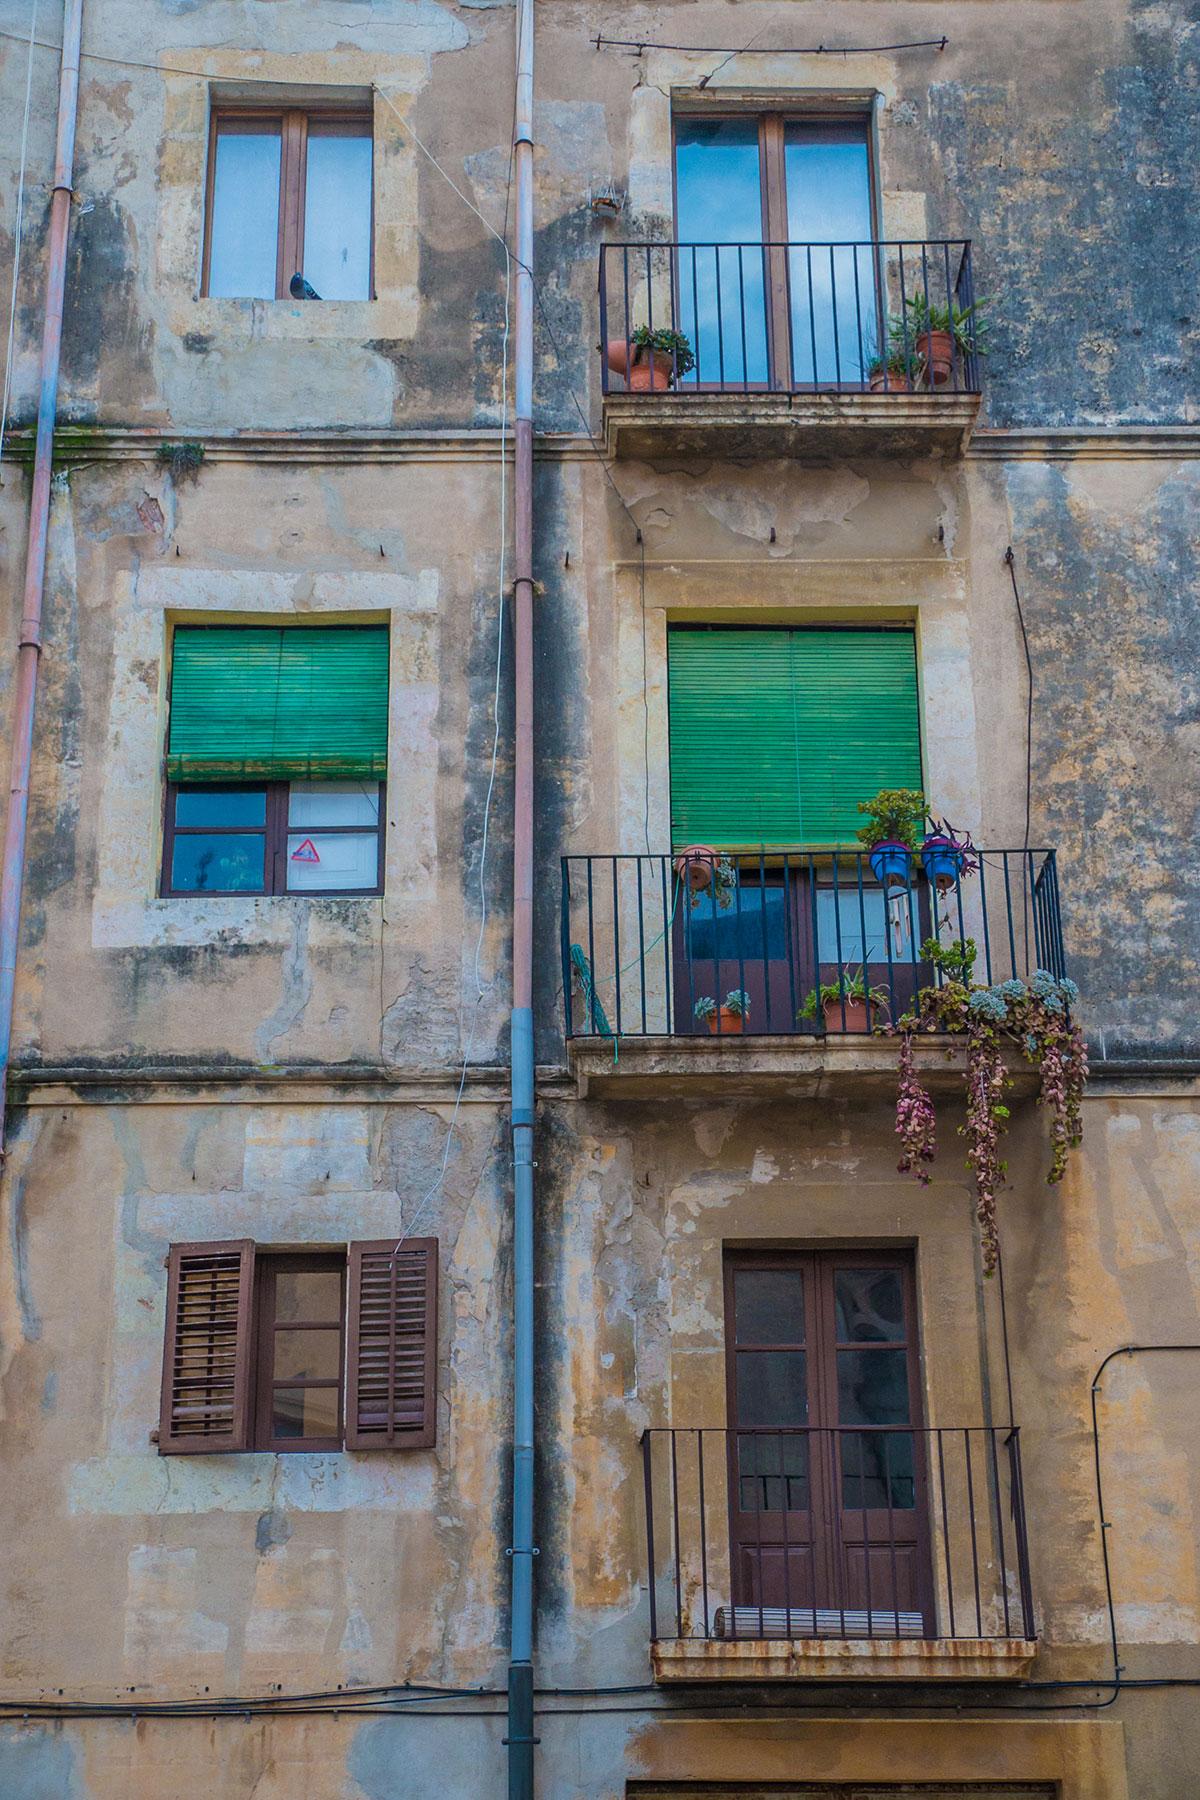 Spanien, Katalonien, Tarragona, Fassade mit Balkonen